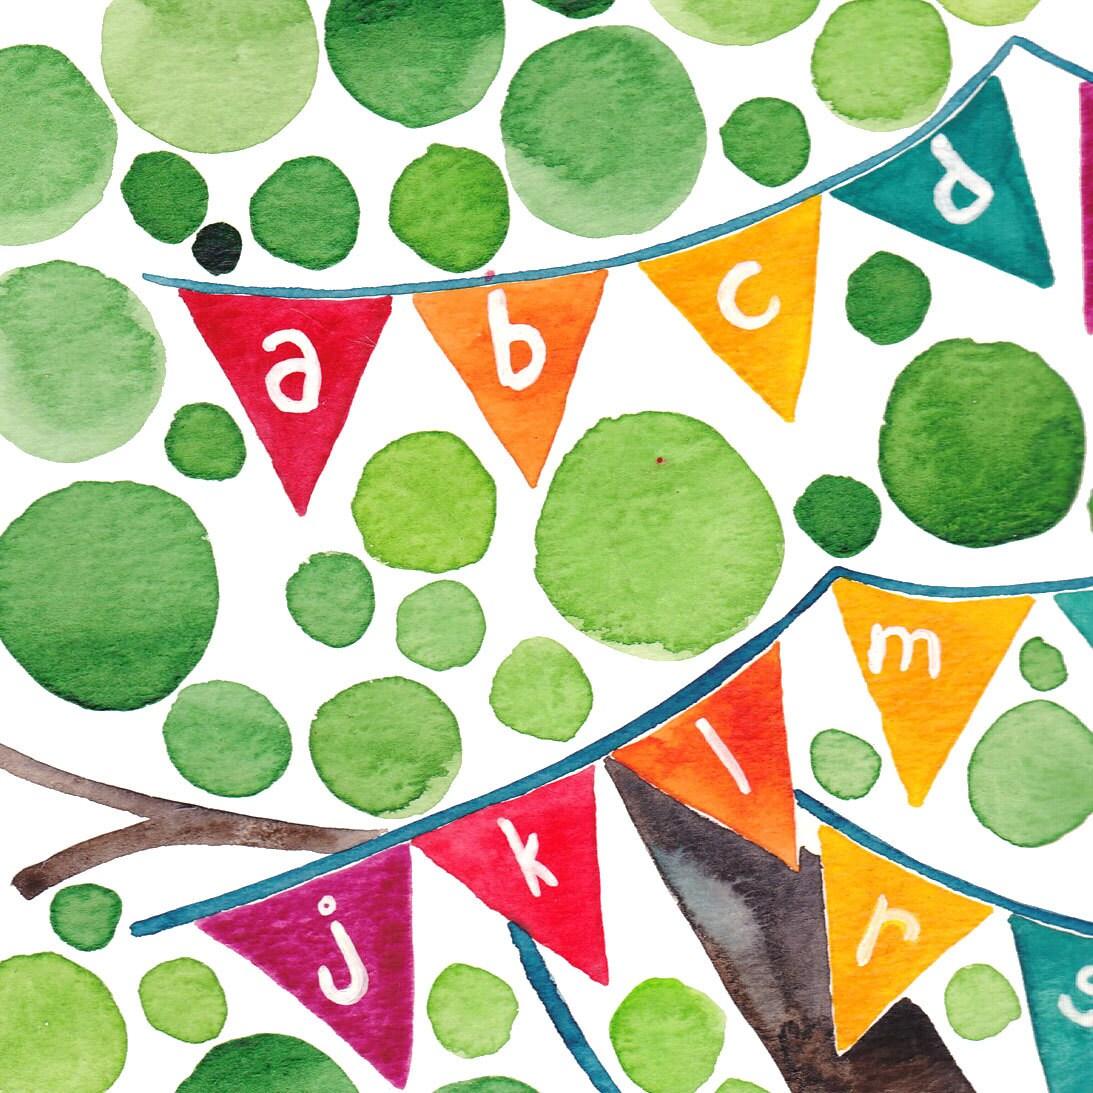 Alphabet Tree Original Watercolour Art Print Reproduction Nursery School Wall Art